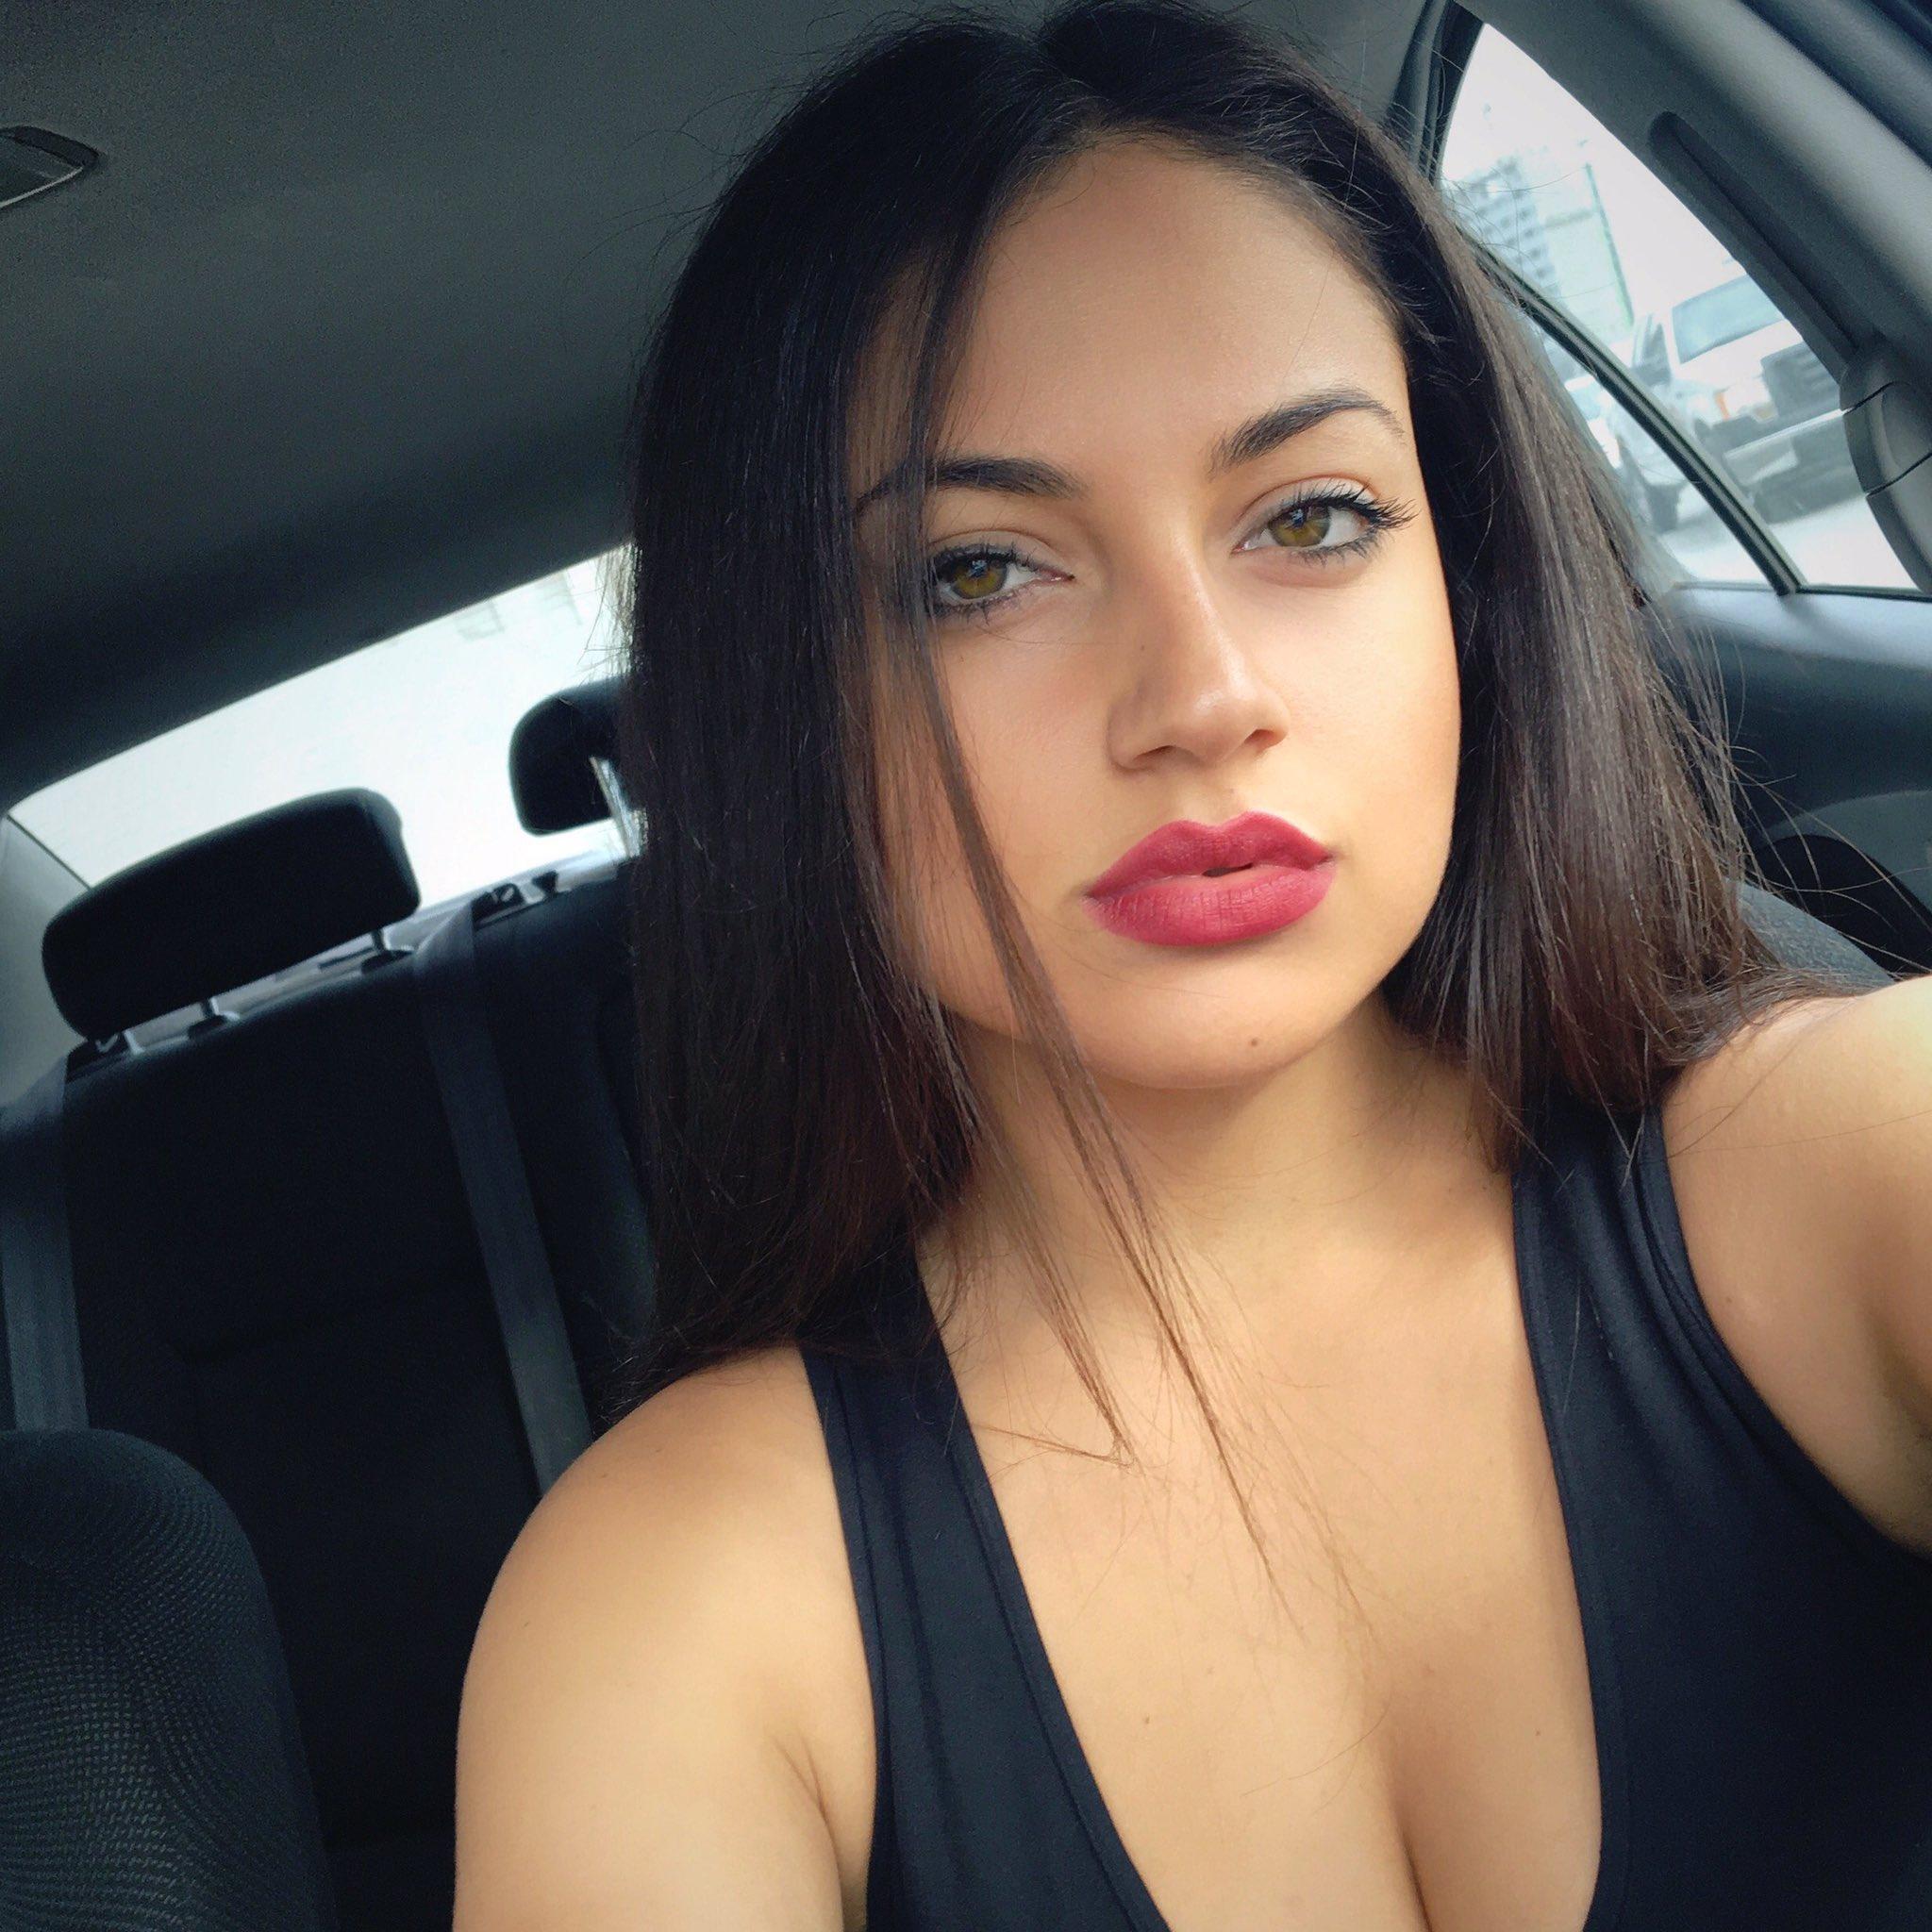 Selfie Inanna Sarkis nude photos 2019